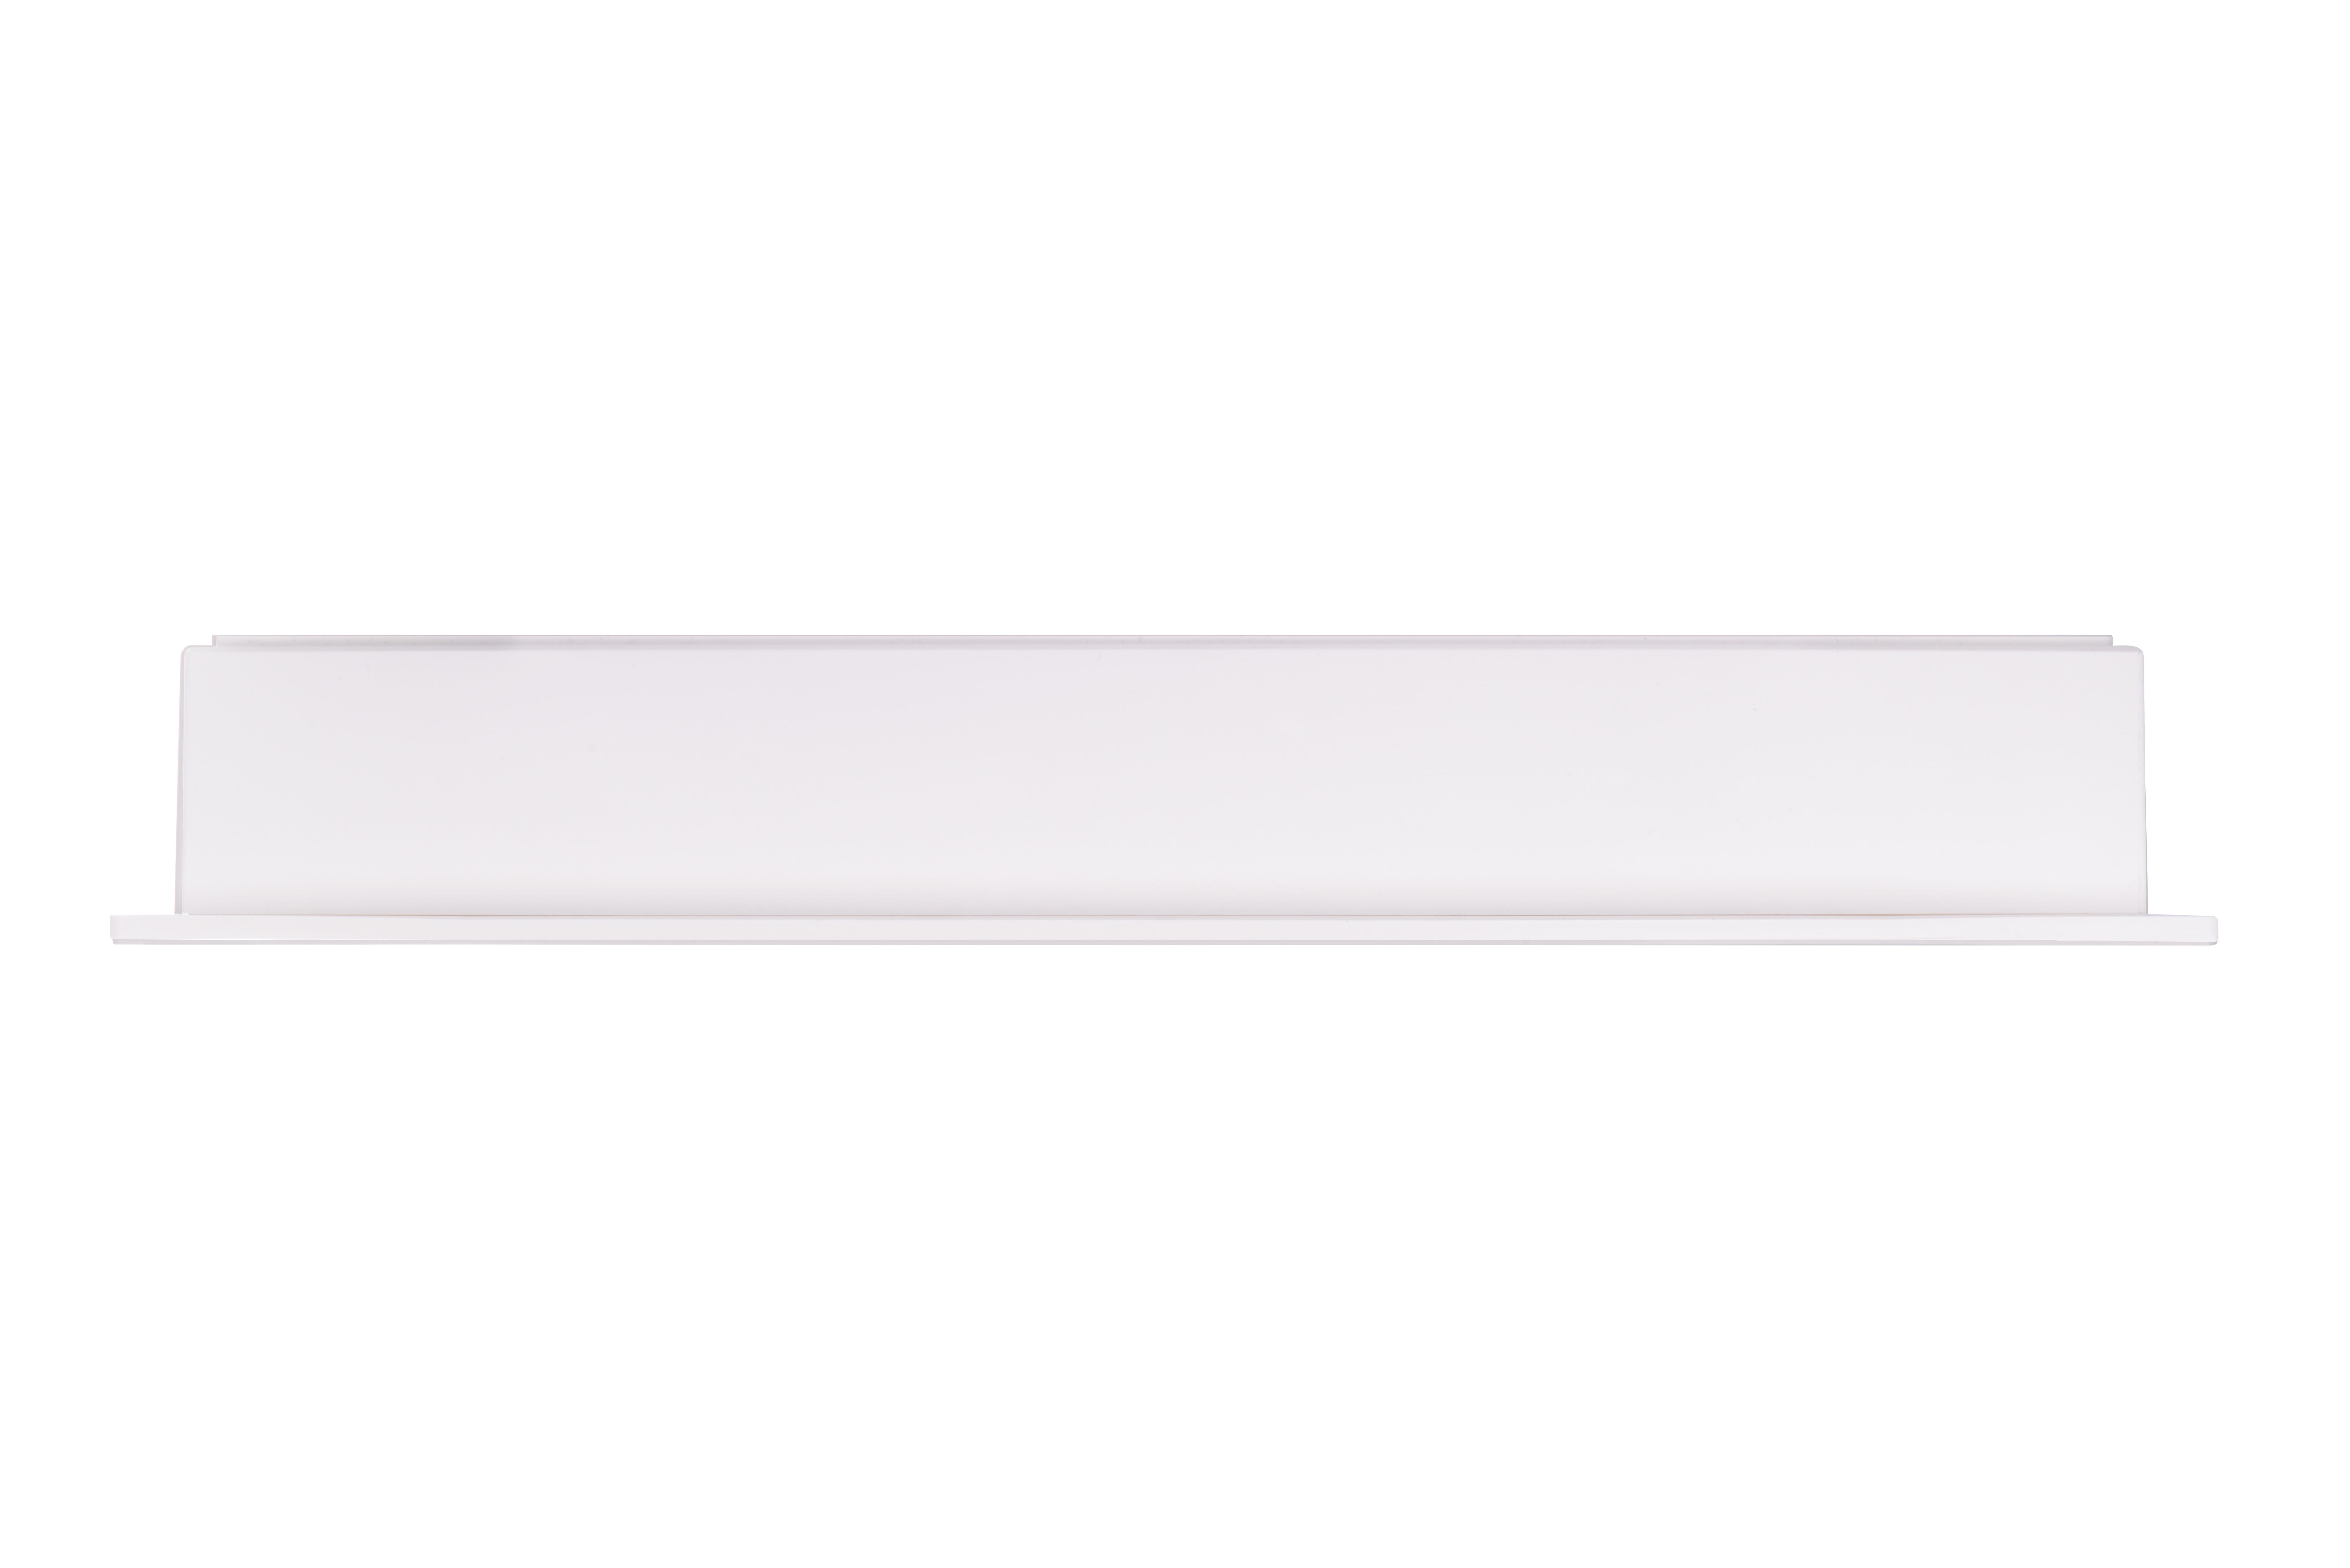 Lampa antipanica led Intelight 94771   2h nementinut test automat 5